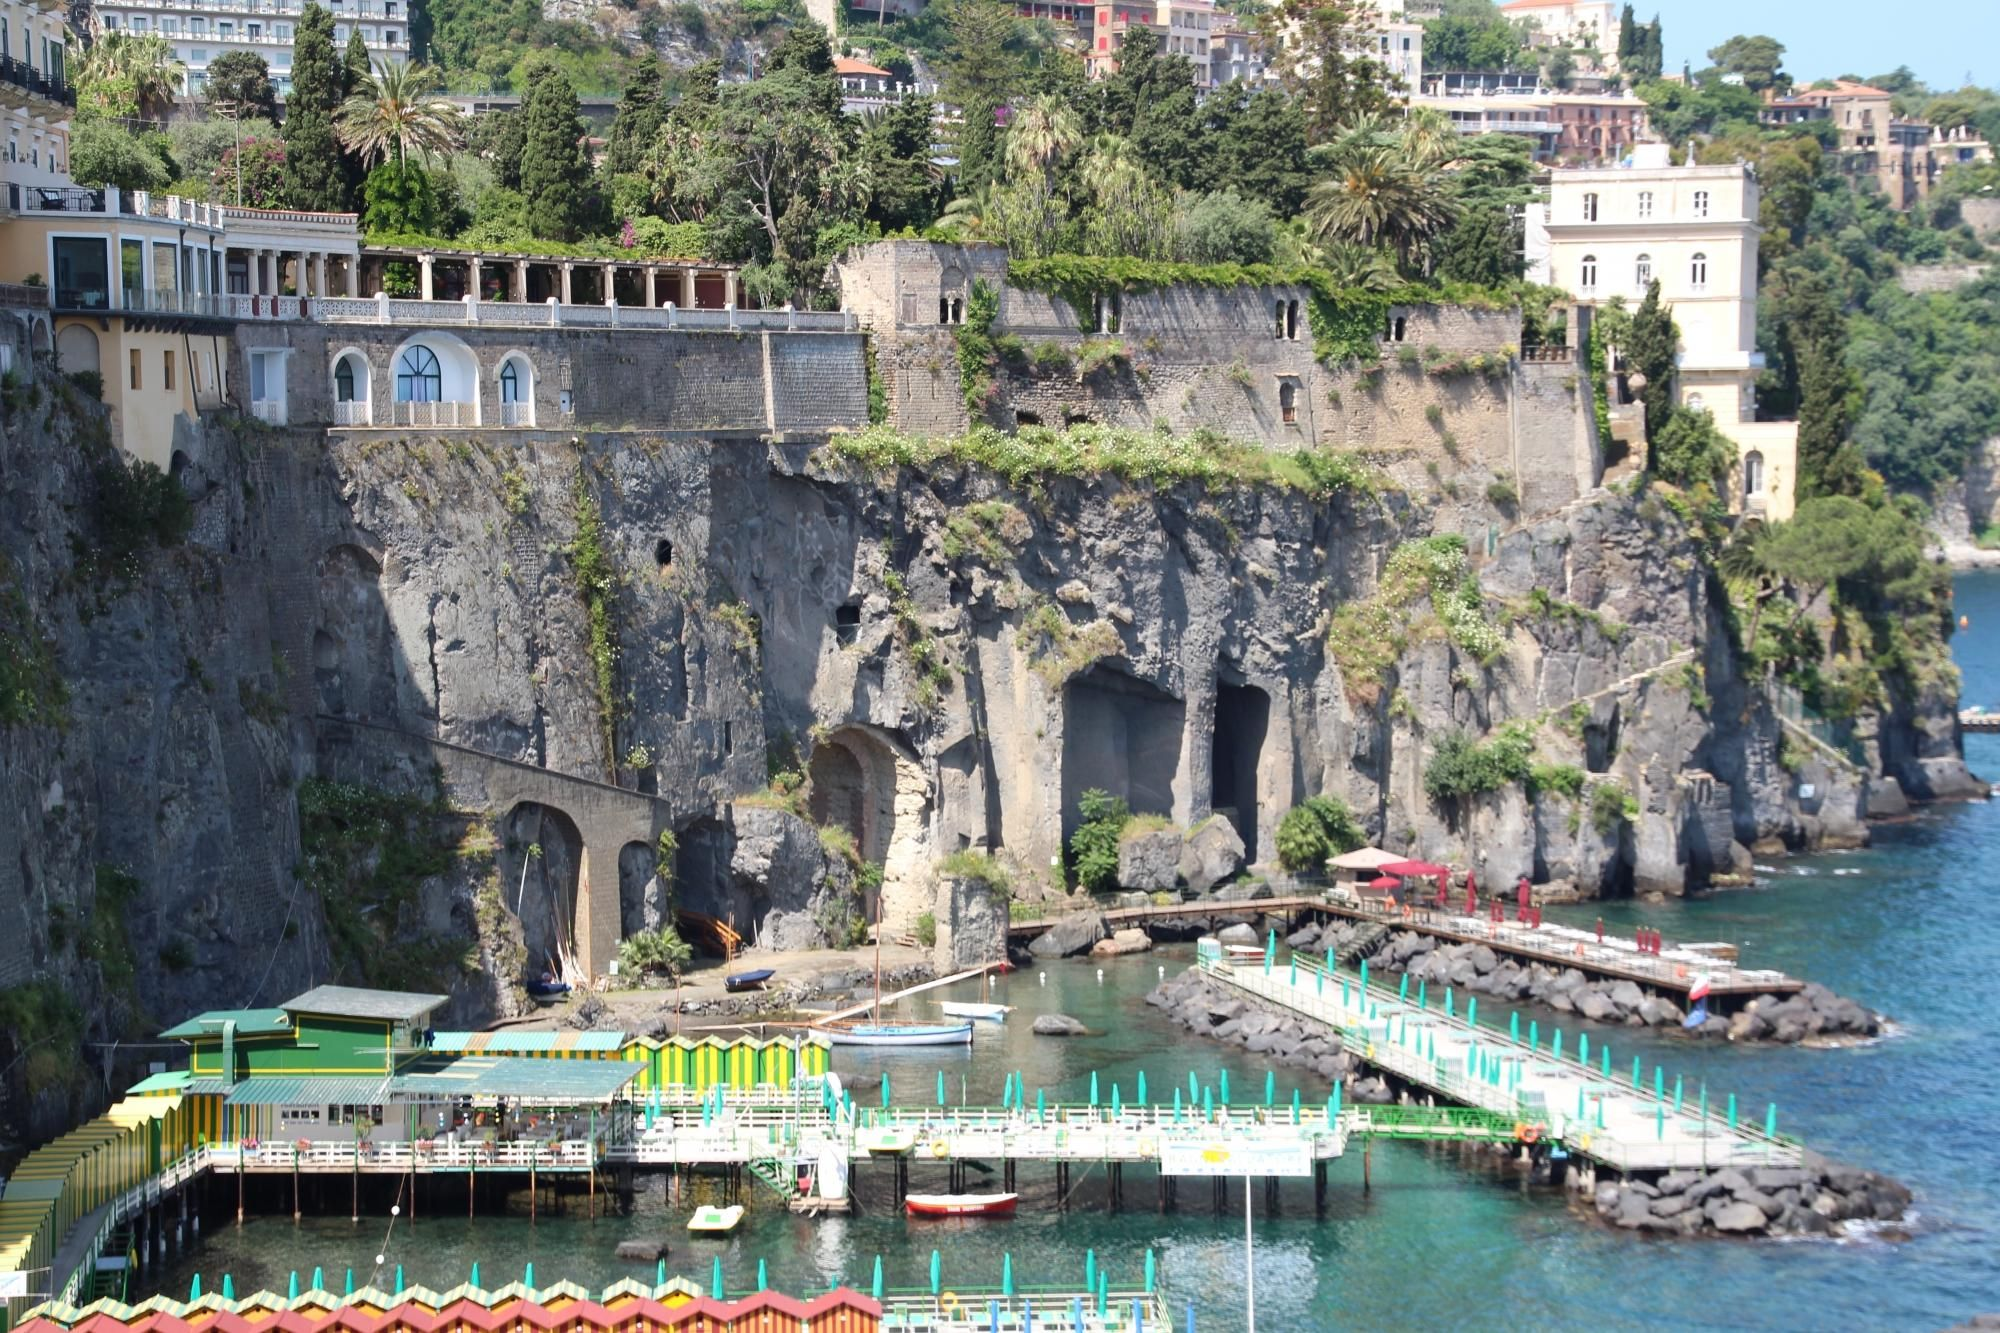 Stabilimento Balneare Bagni Salvatore, Sorrento: See 63 reviews ...